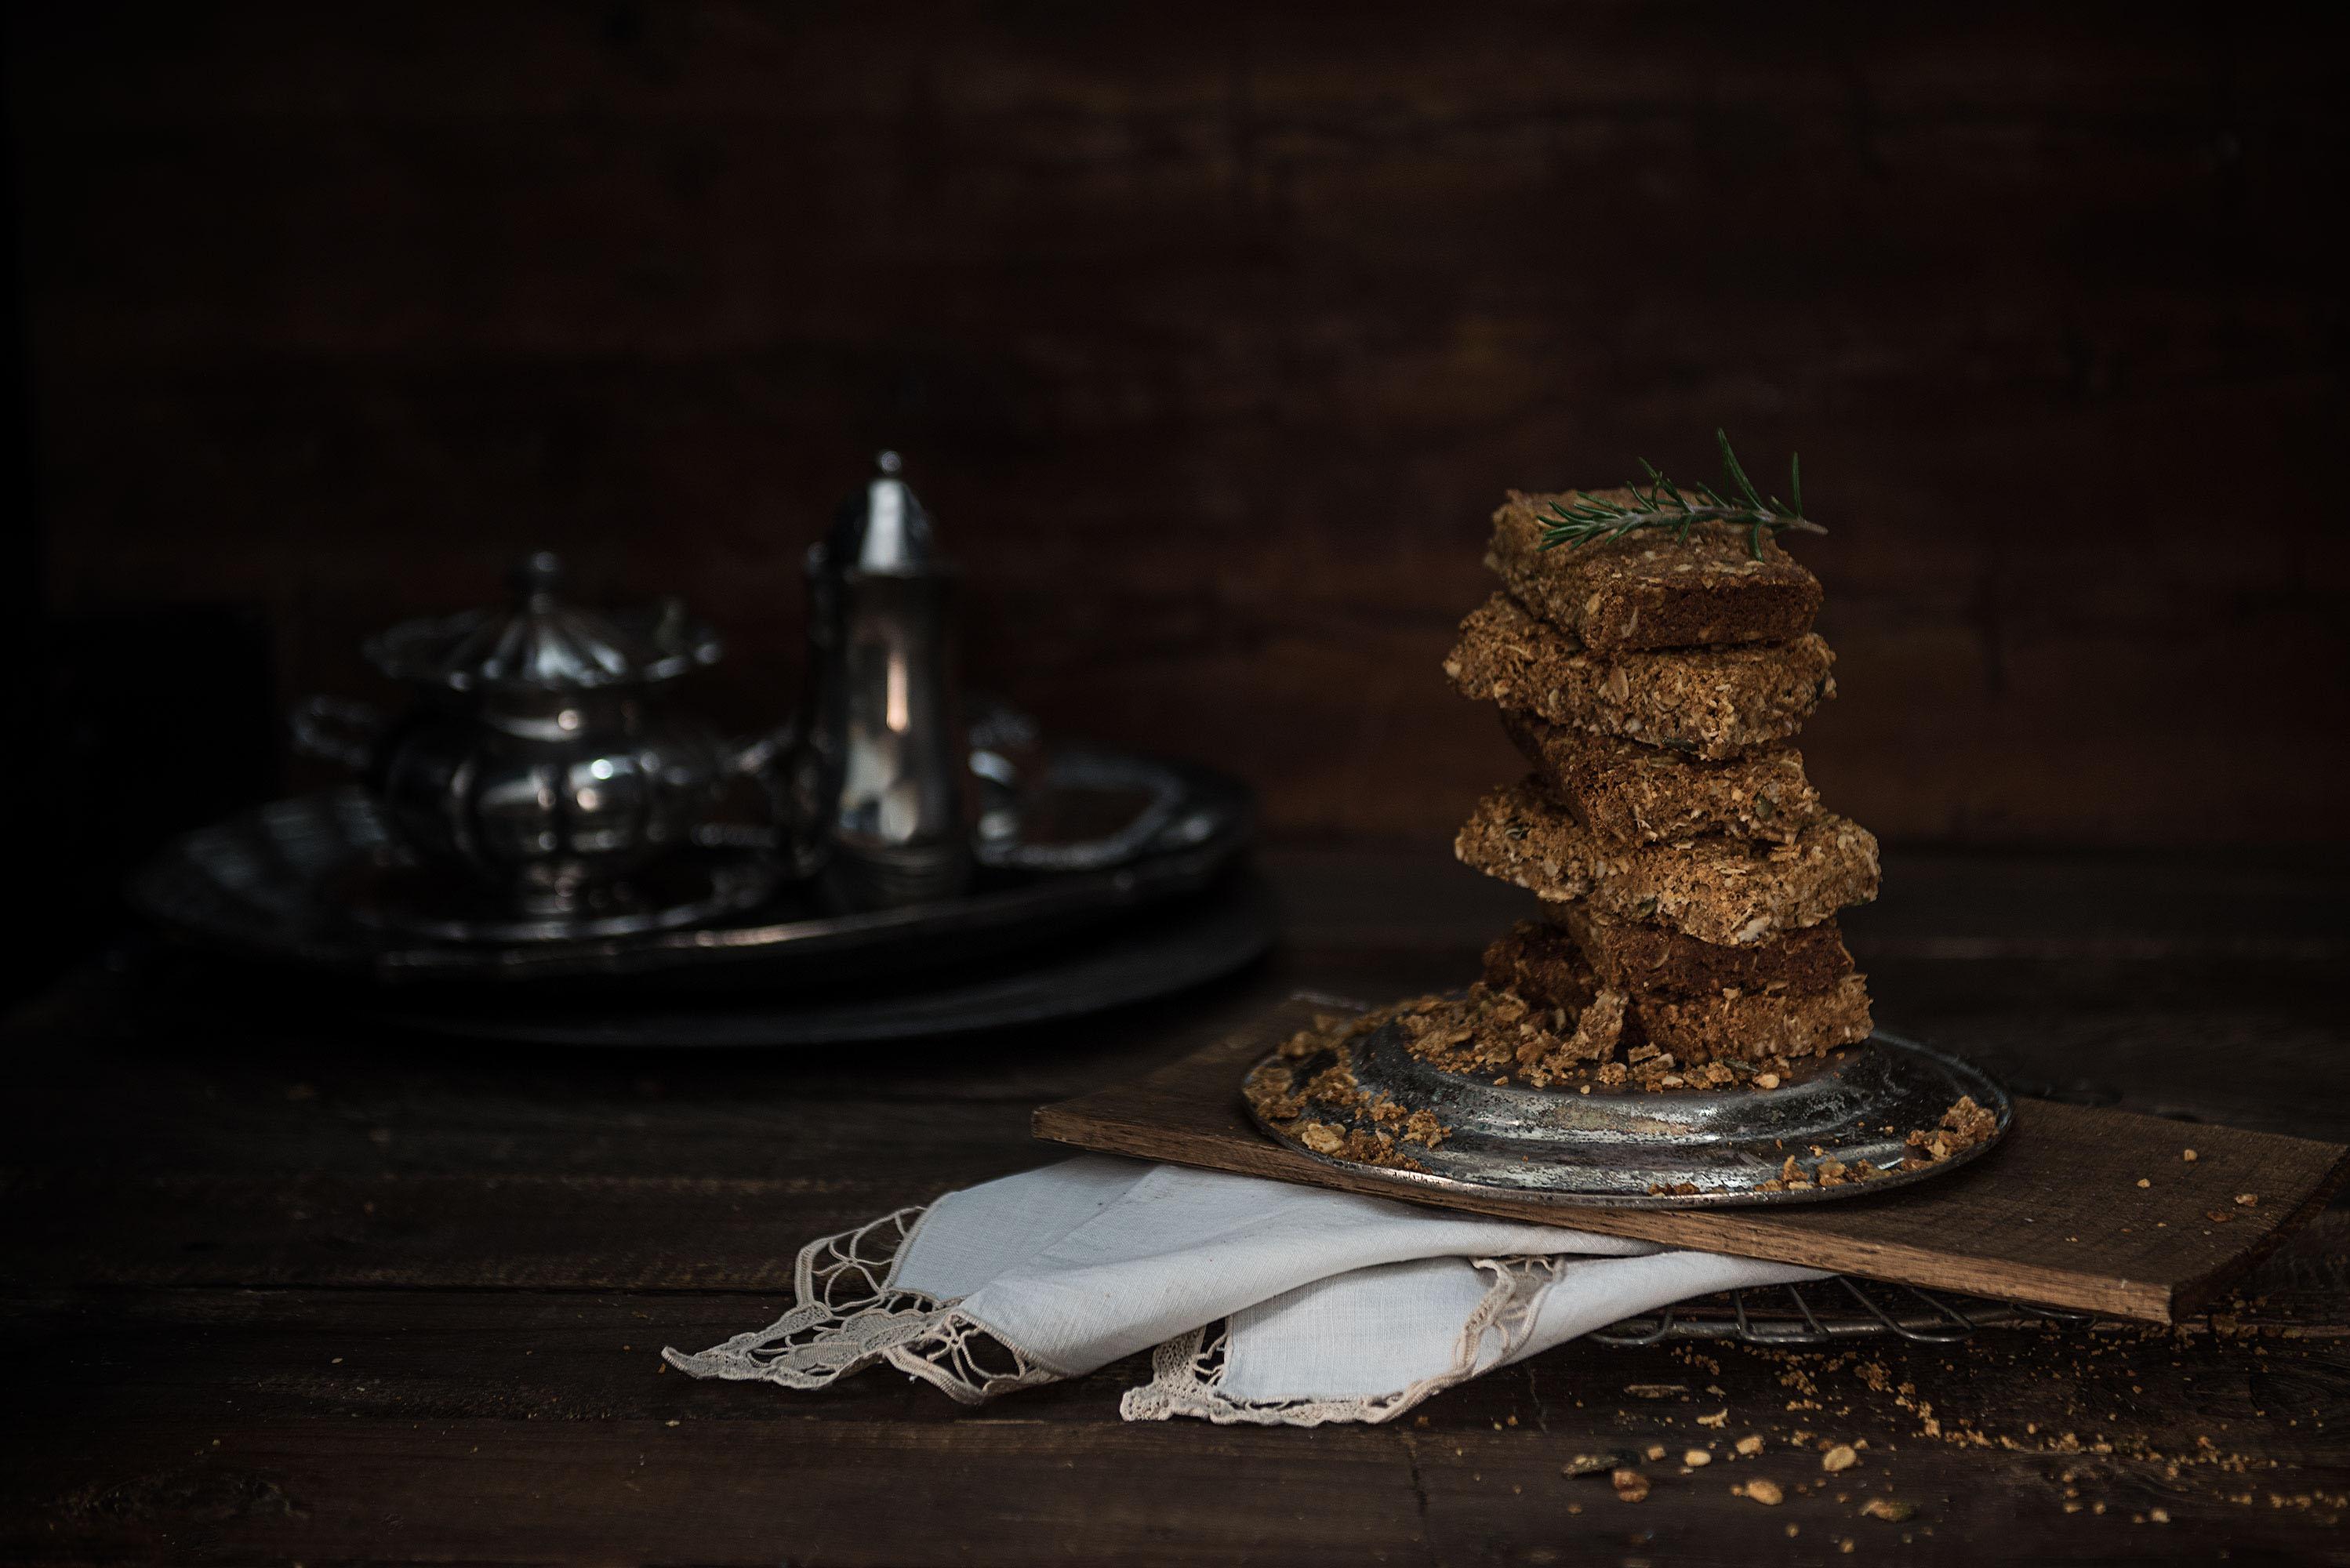 food photography hacks